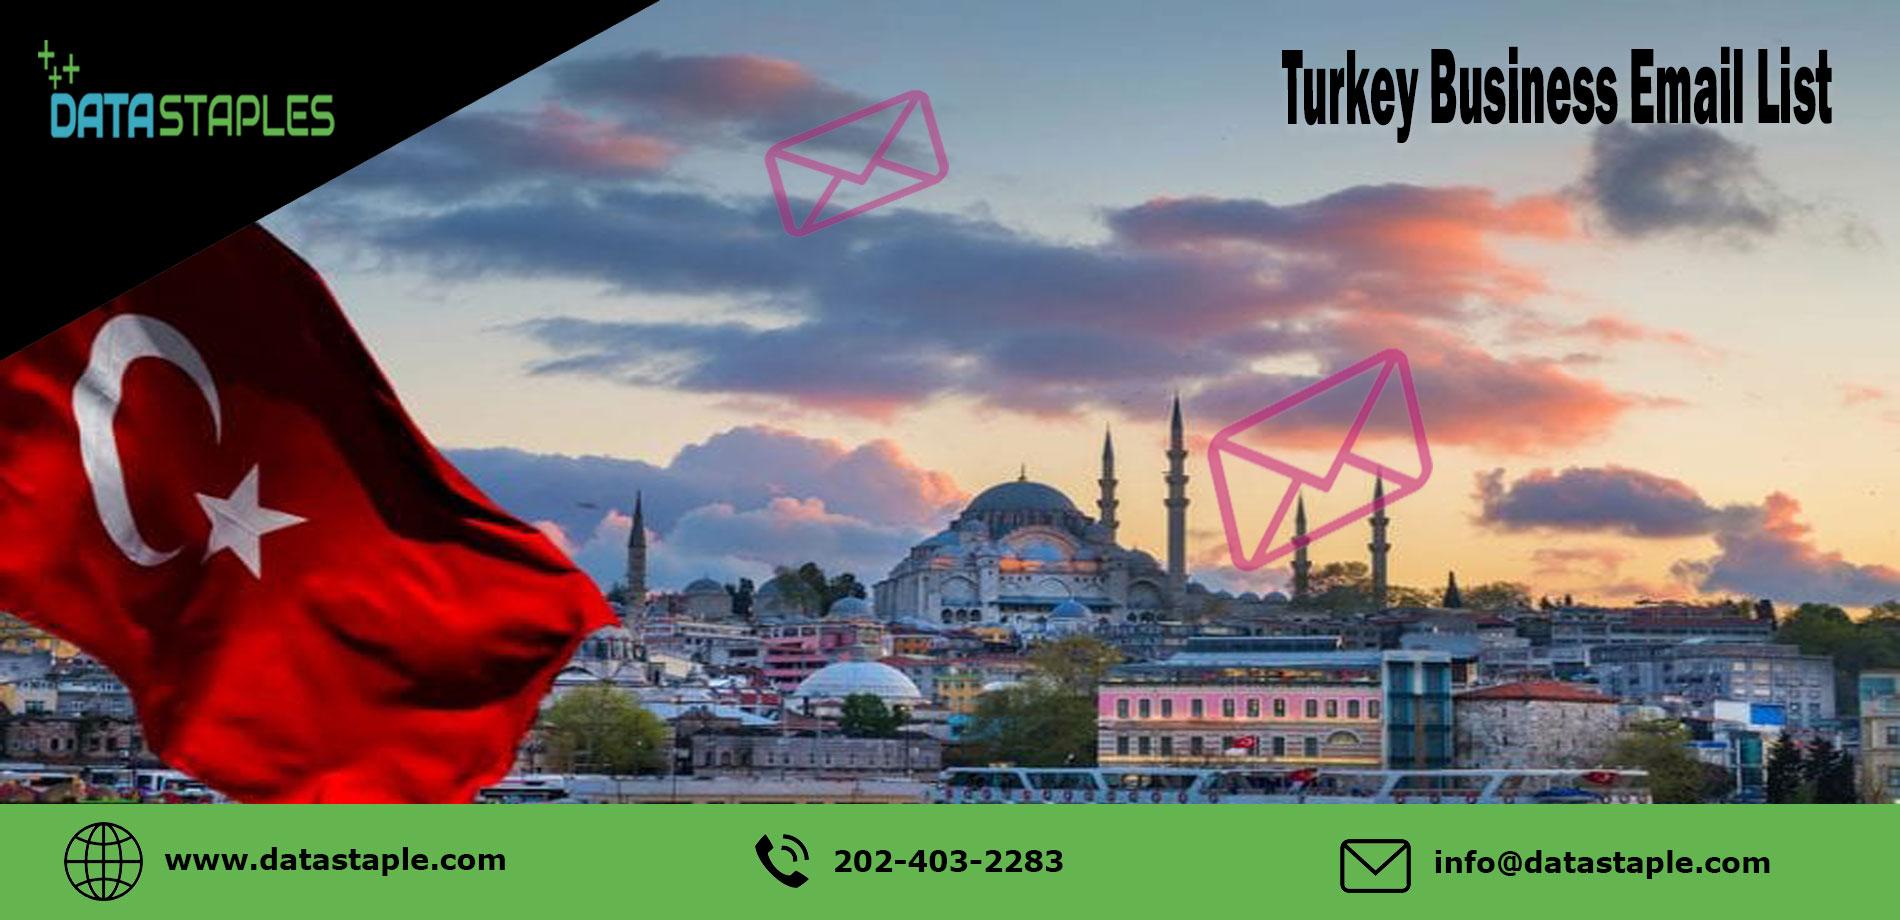 Turkey Business Email List | DataStaples